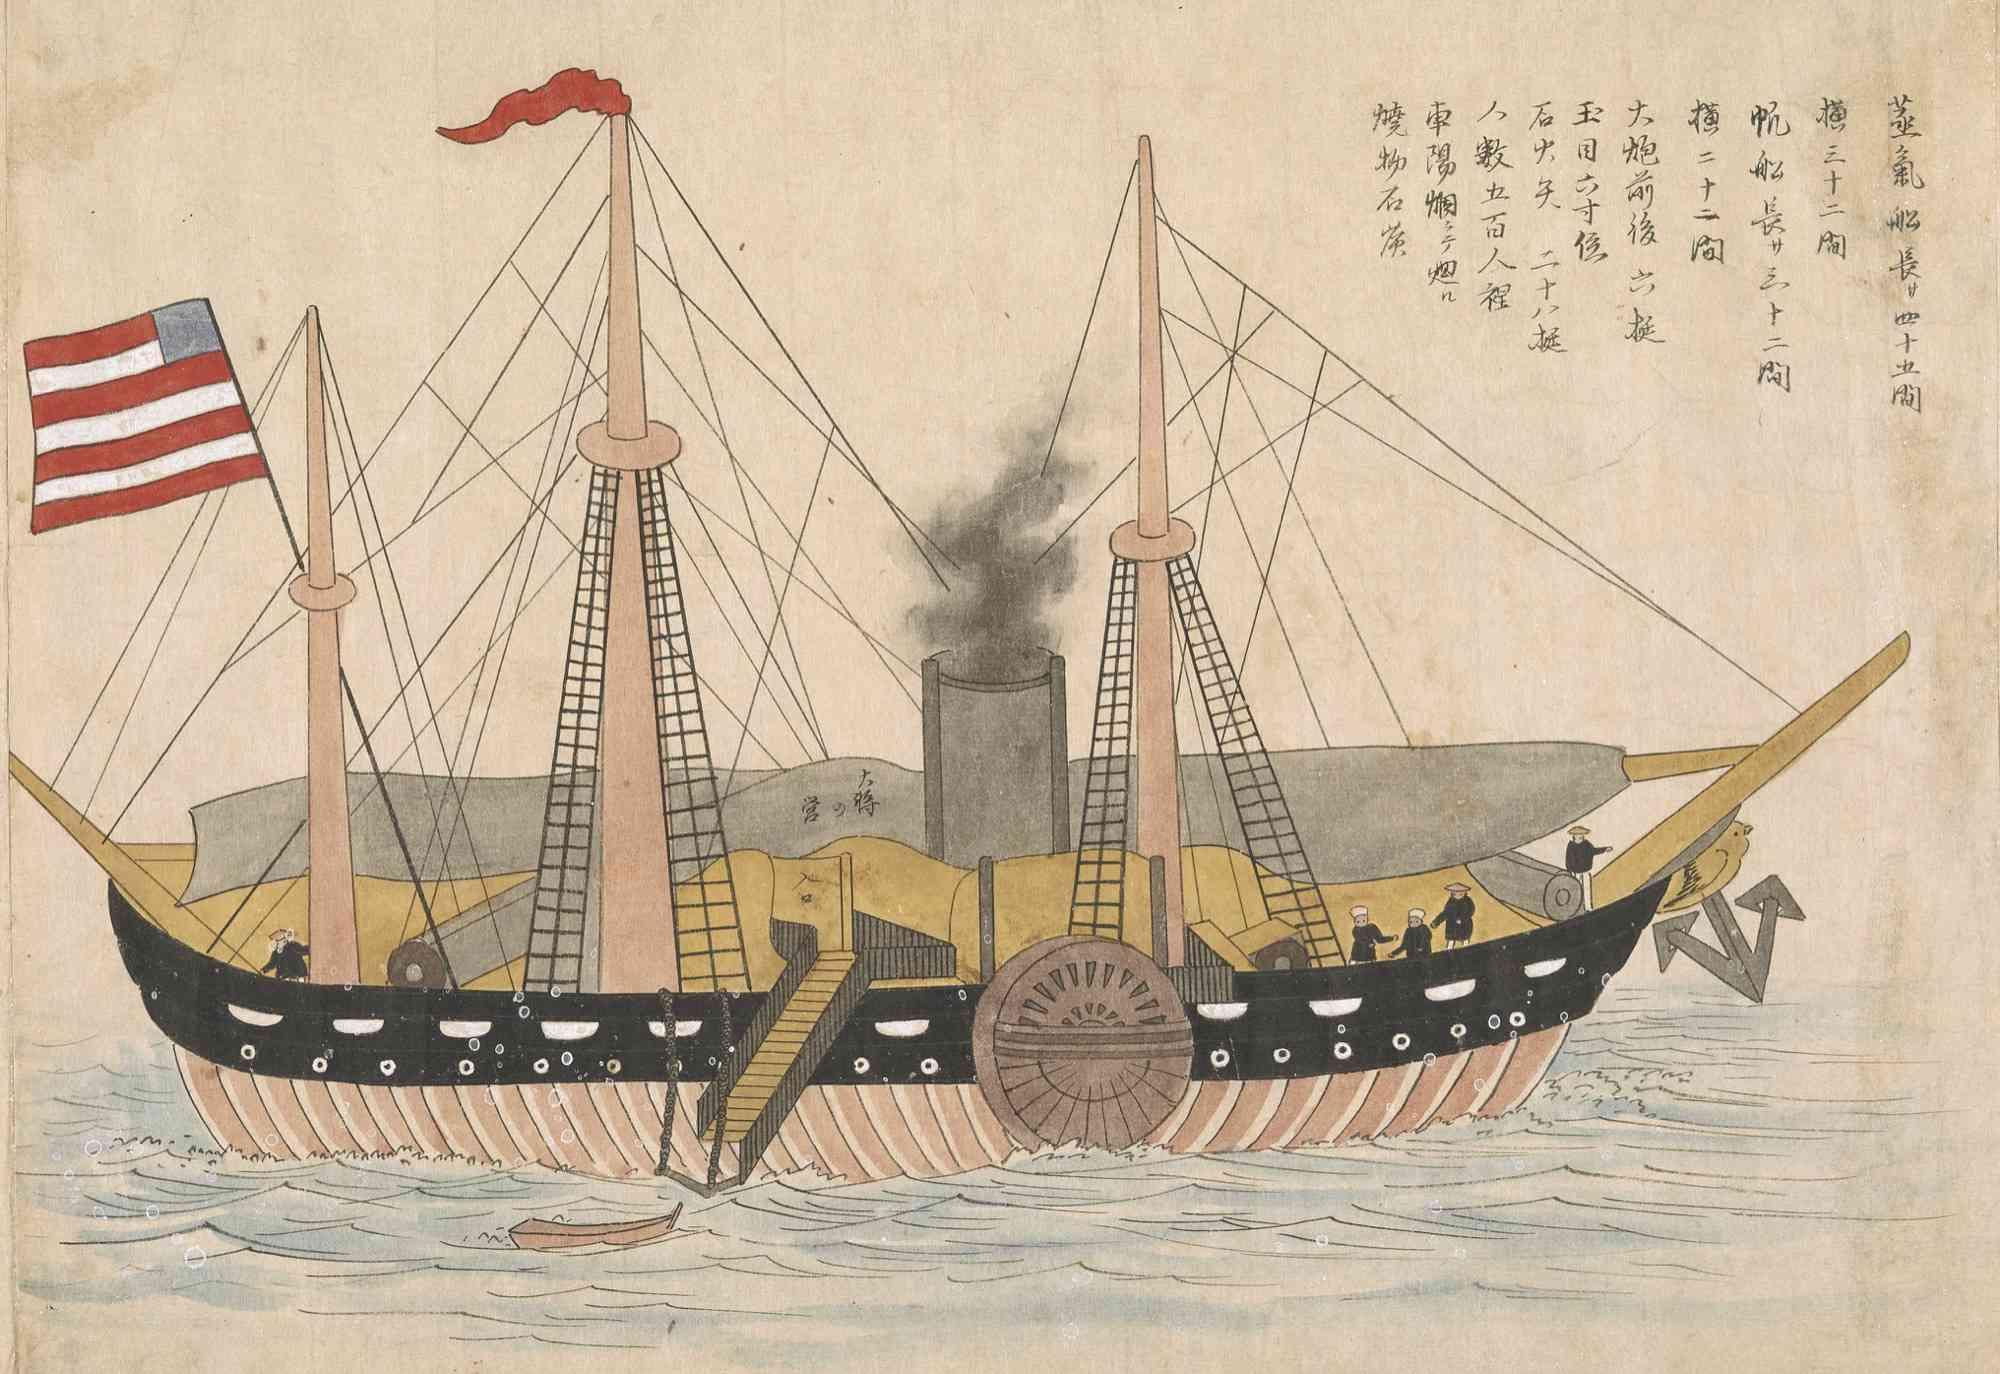 kapal Susquehanna, kapal utama armada kapten Perry